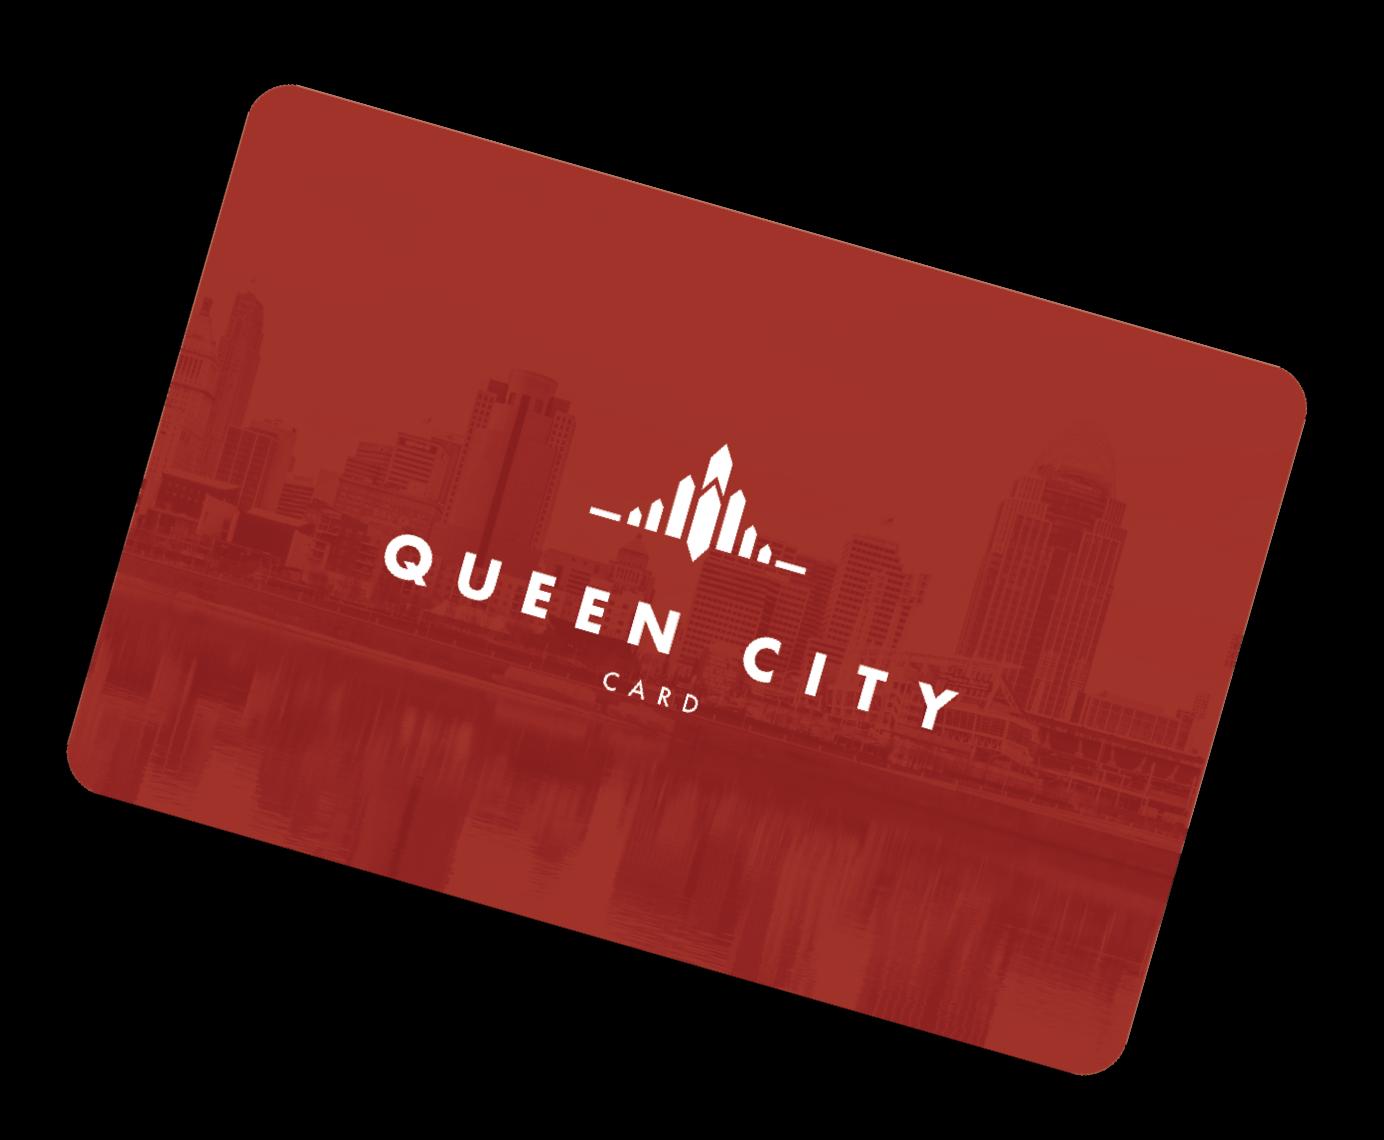 Queen city gift card